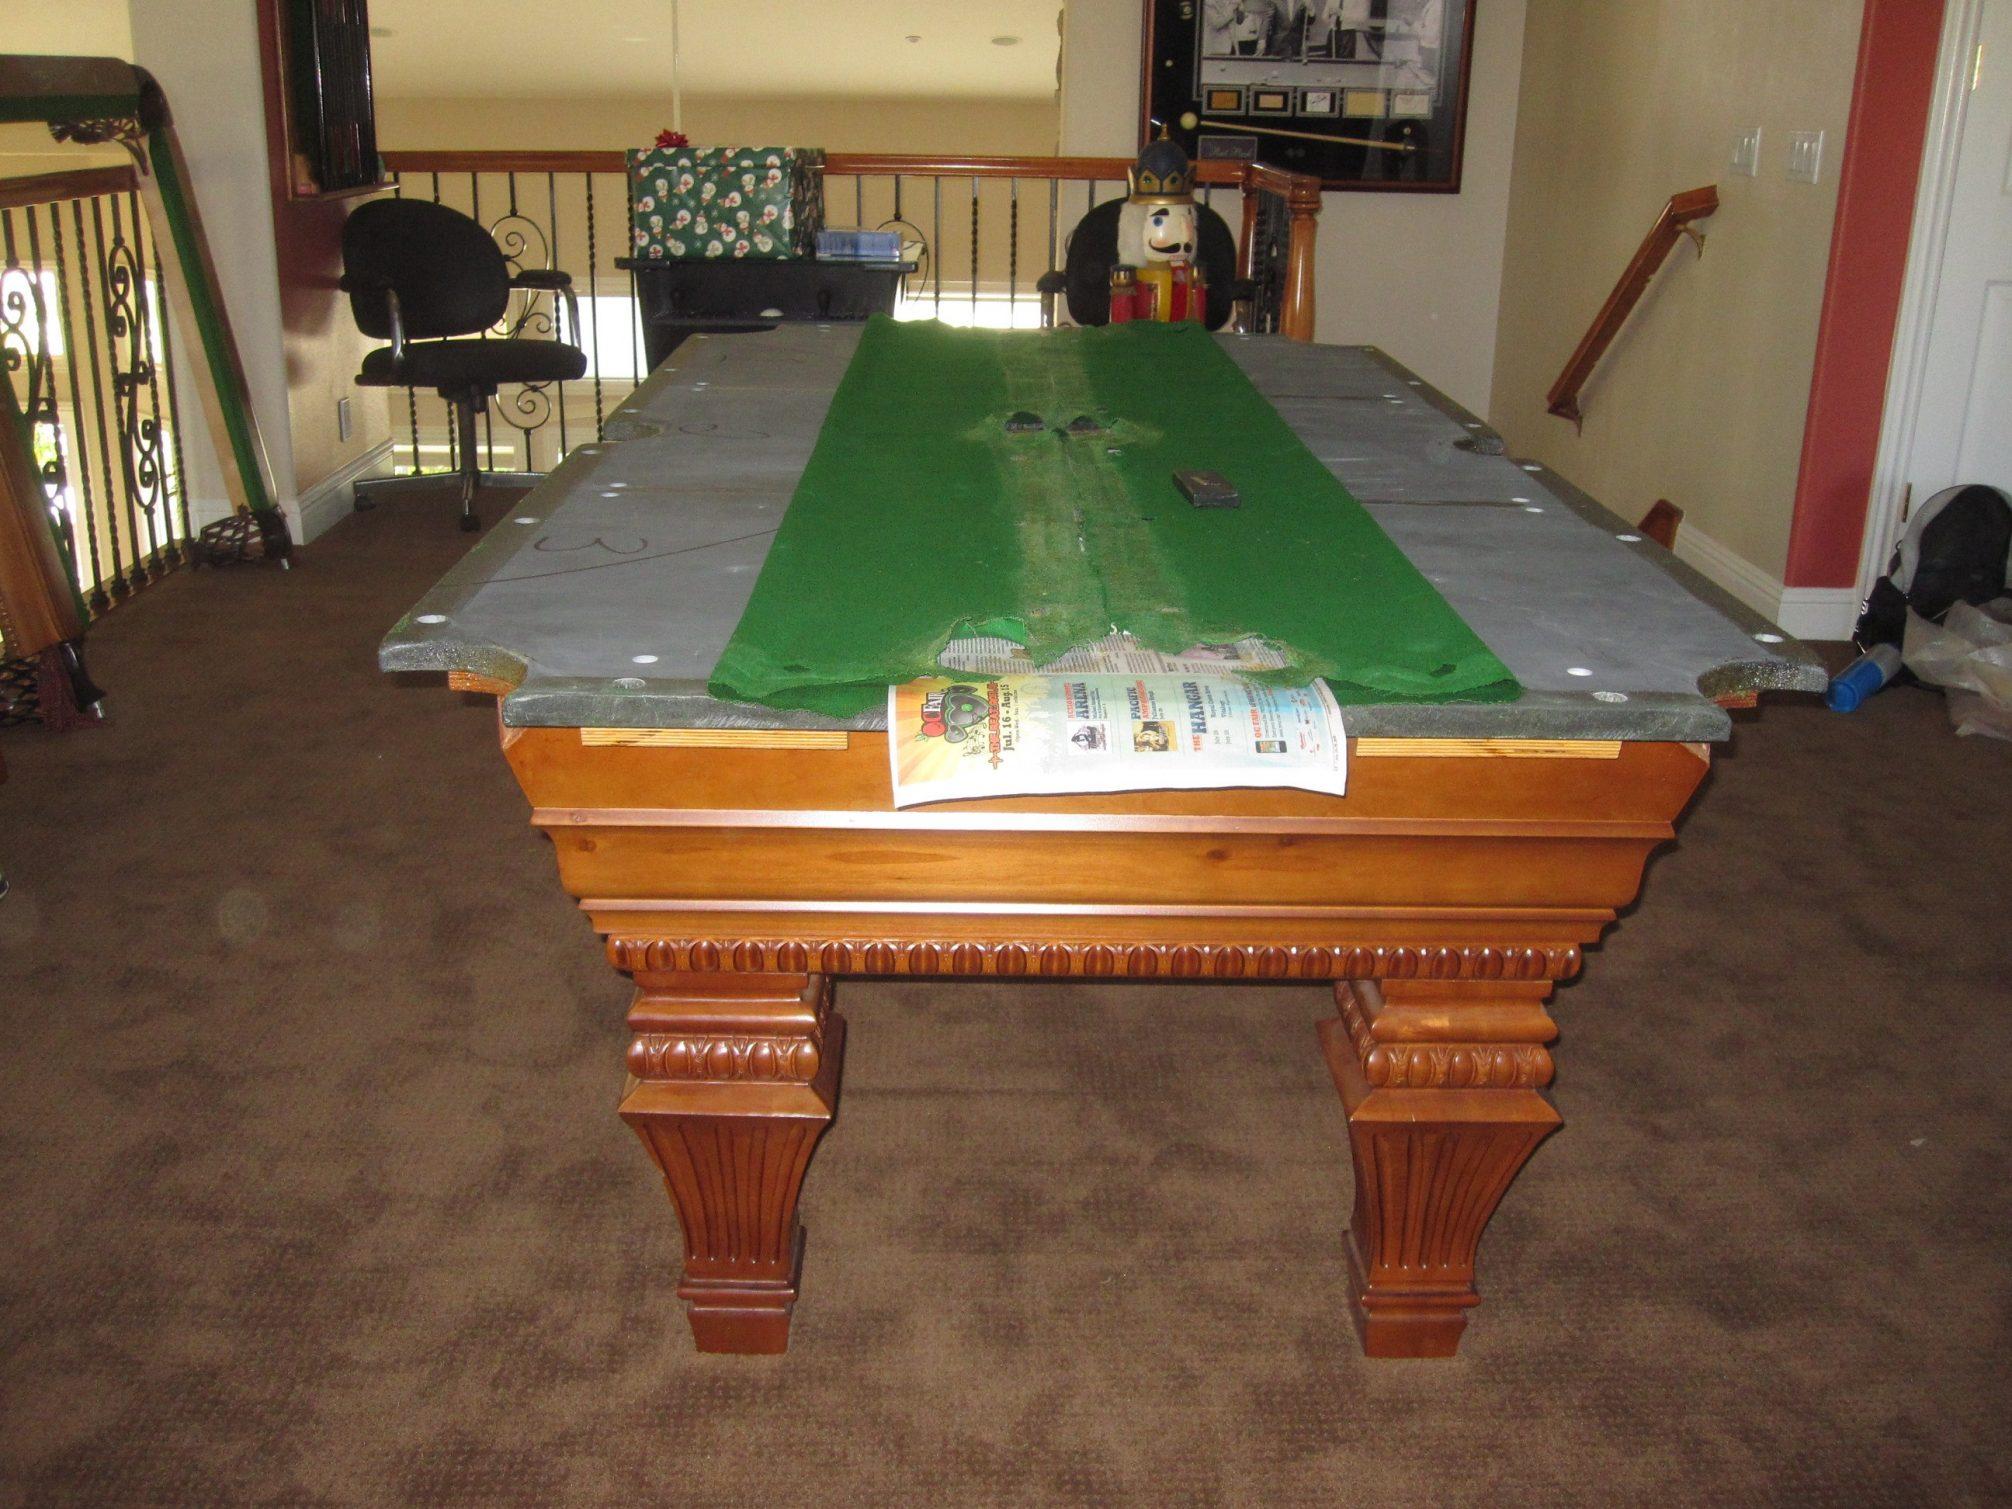 How to install a slate pool table dk billiards pool - Slate pool table ...